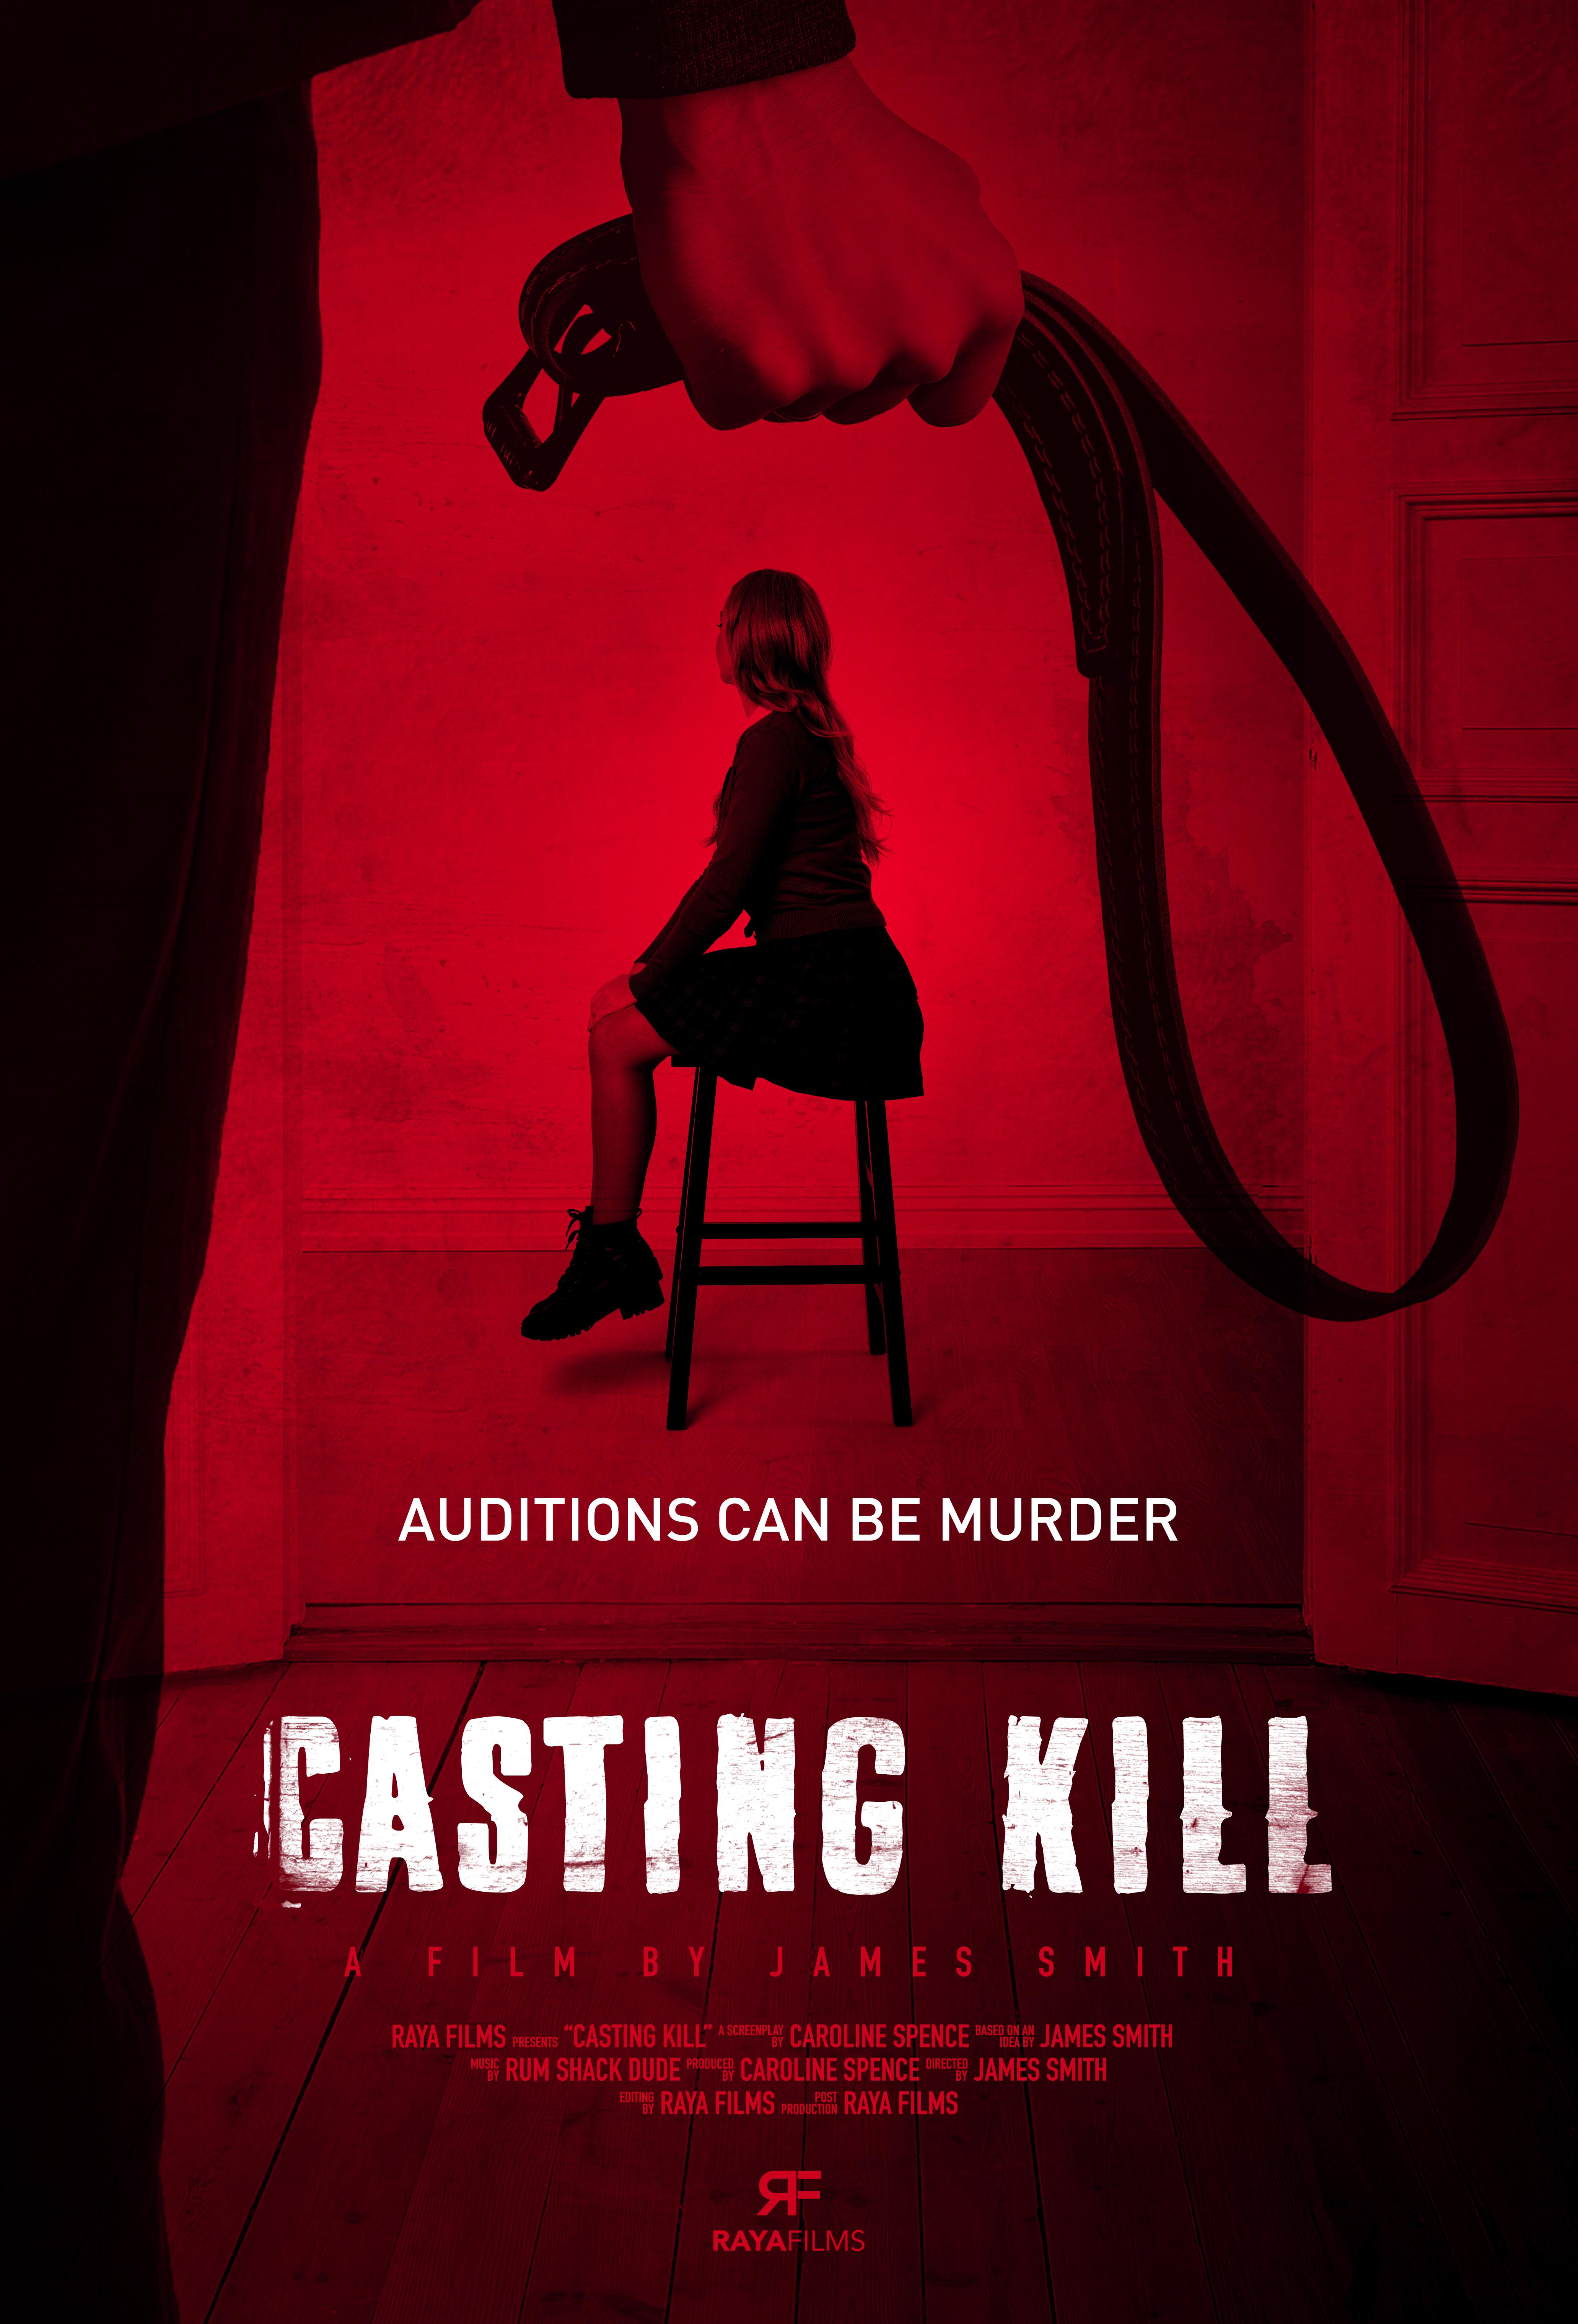 casting_kill_one_sheet_ajpg